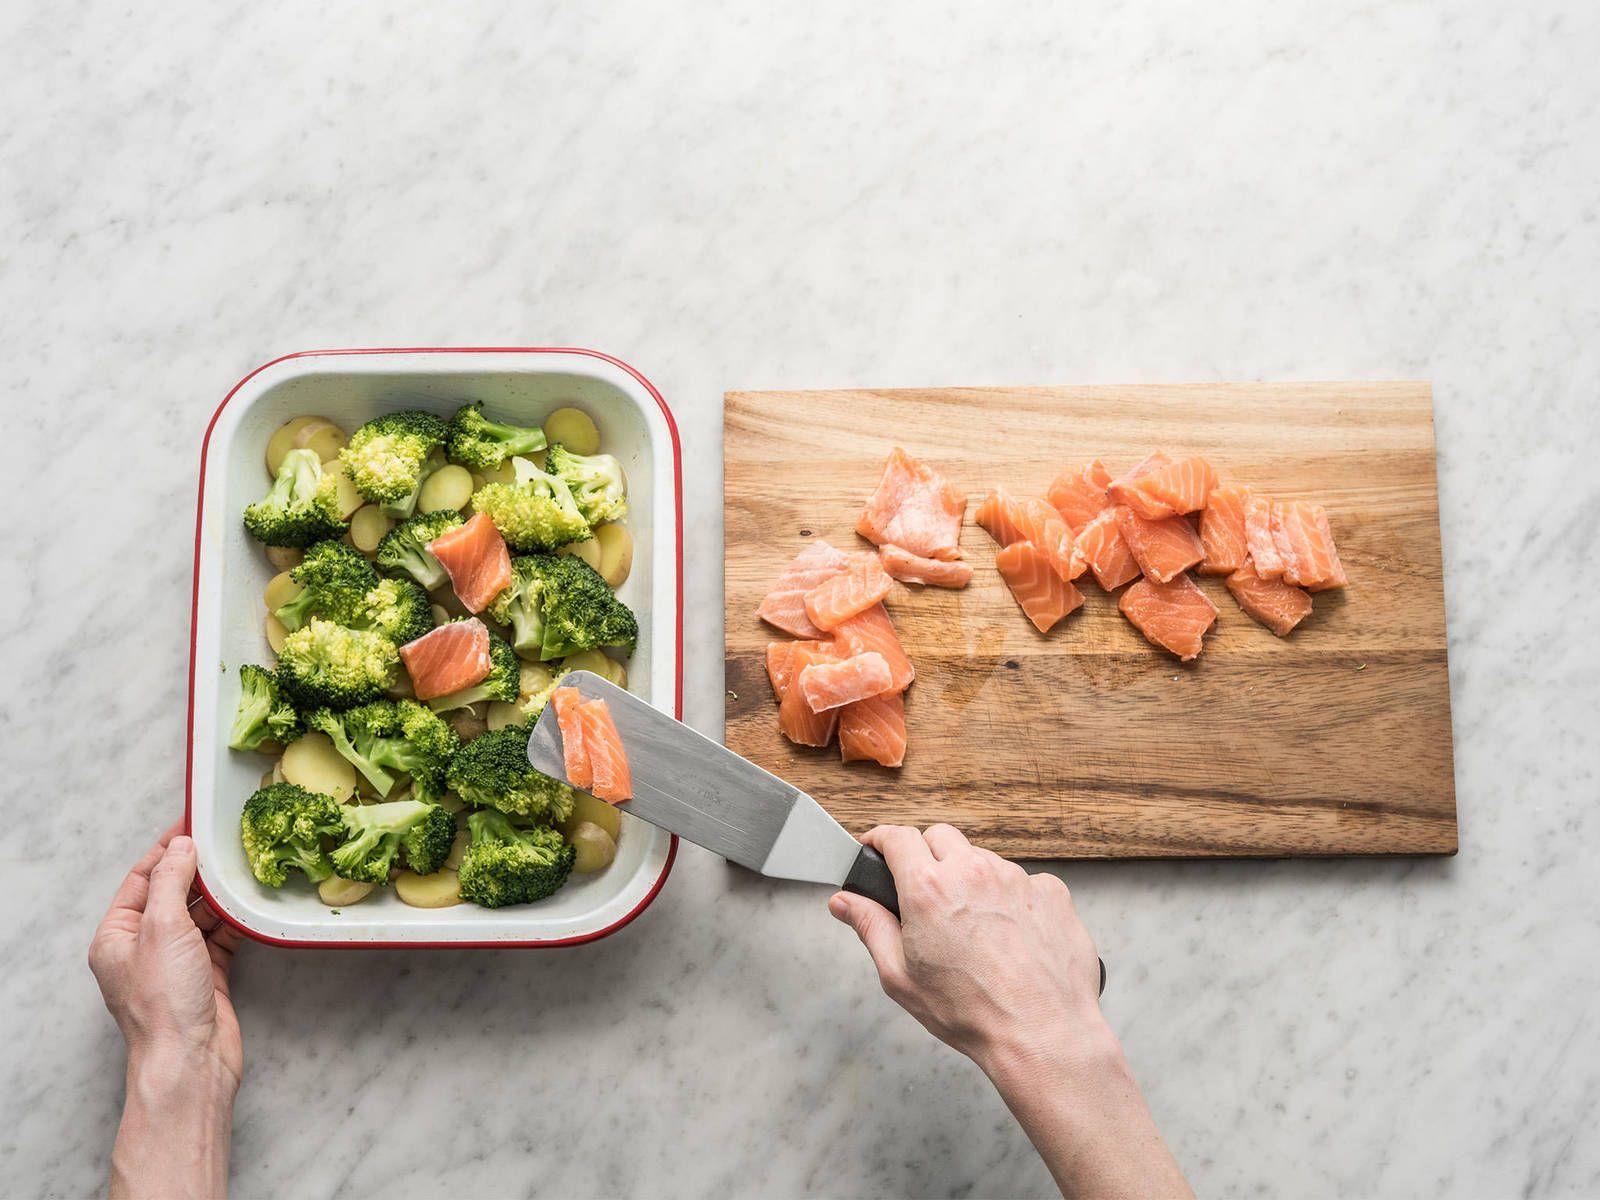 Salmon and broccoli casserole #potatowedgesselbermachen